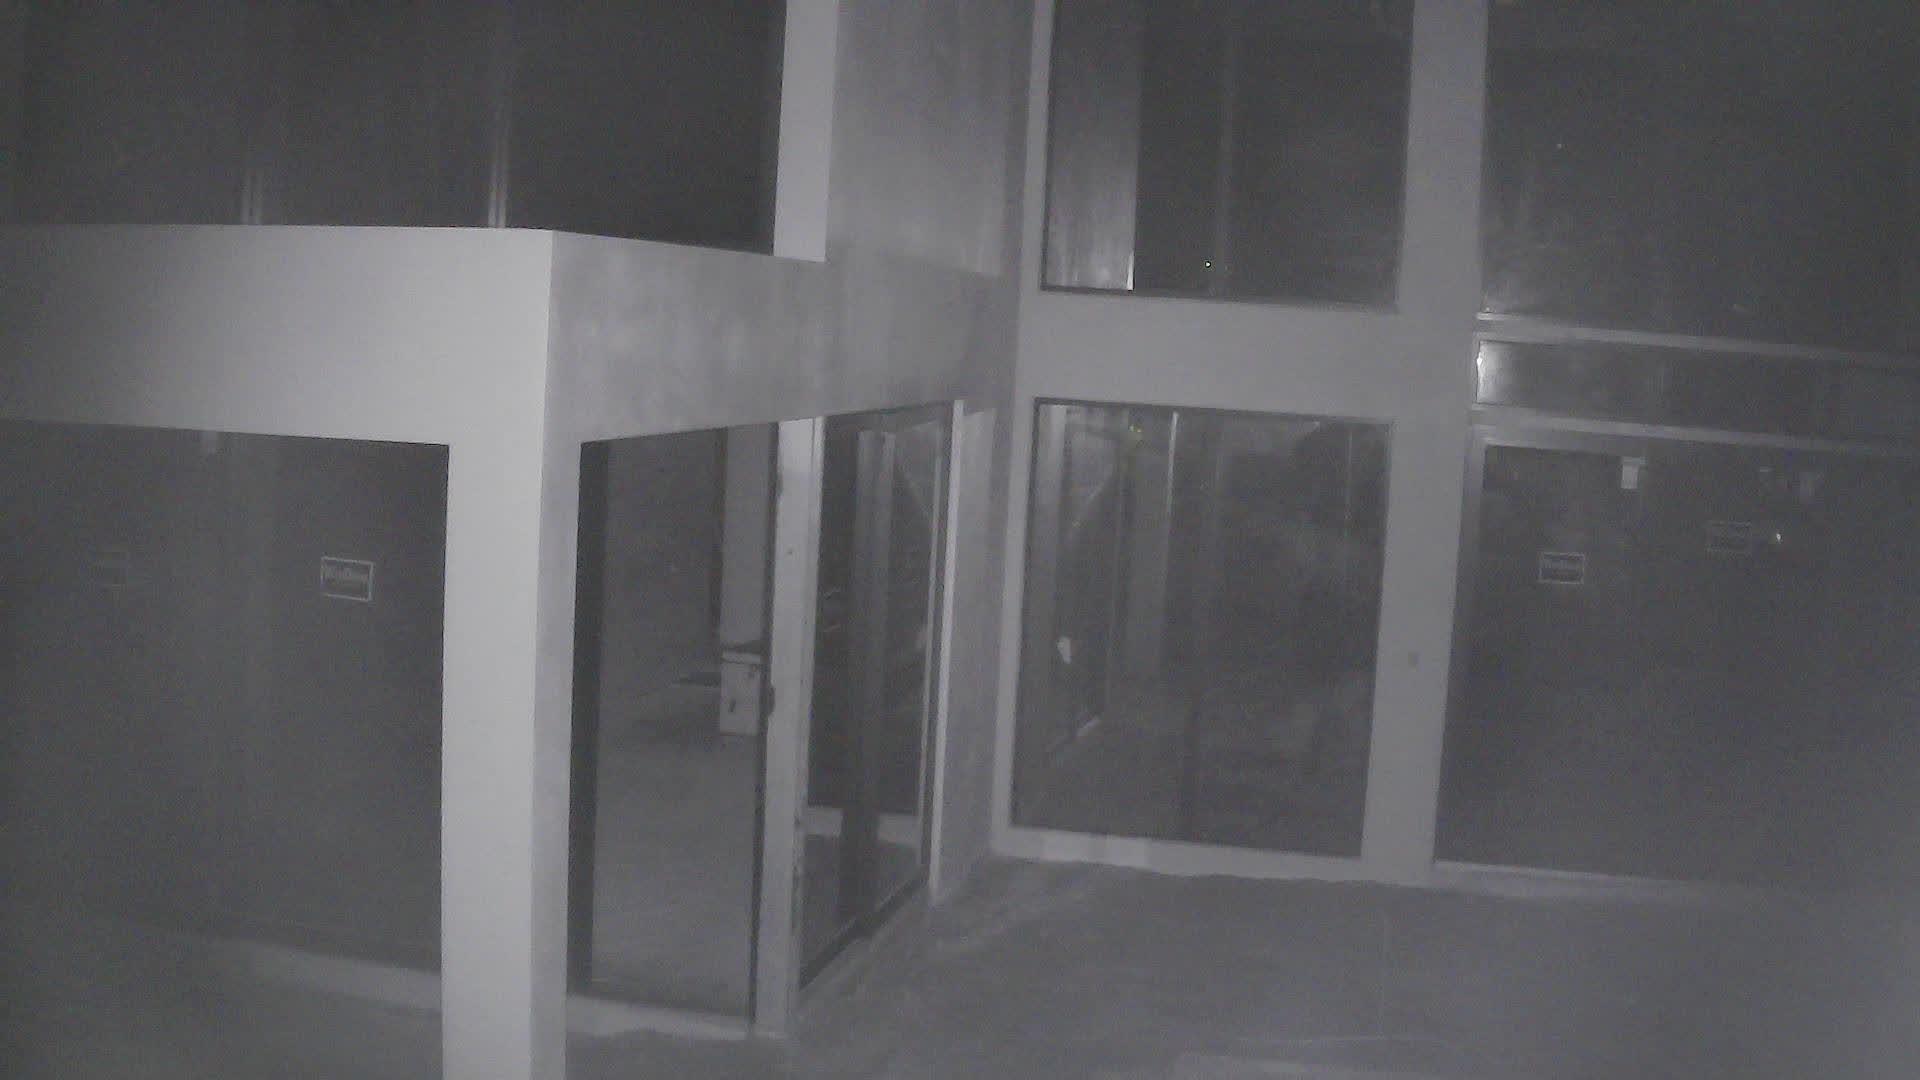 New Construction - 354 NE 6TH @ 8/14/2020 7:15:06 AM